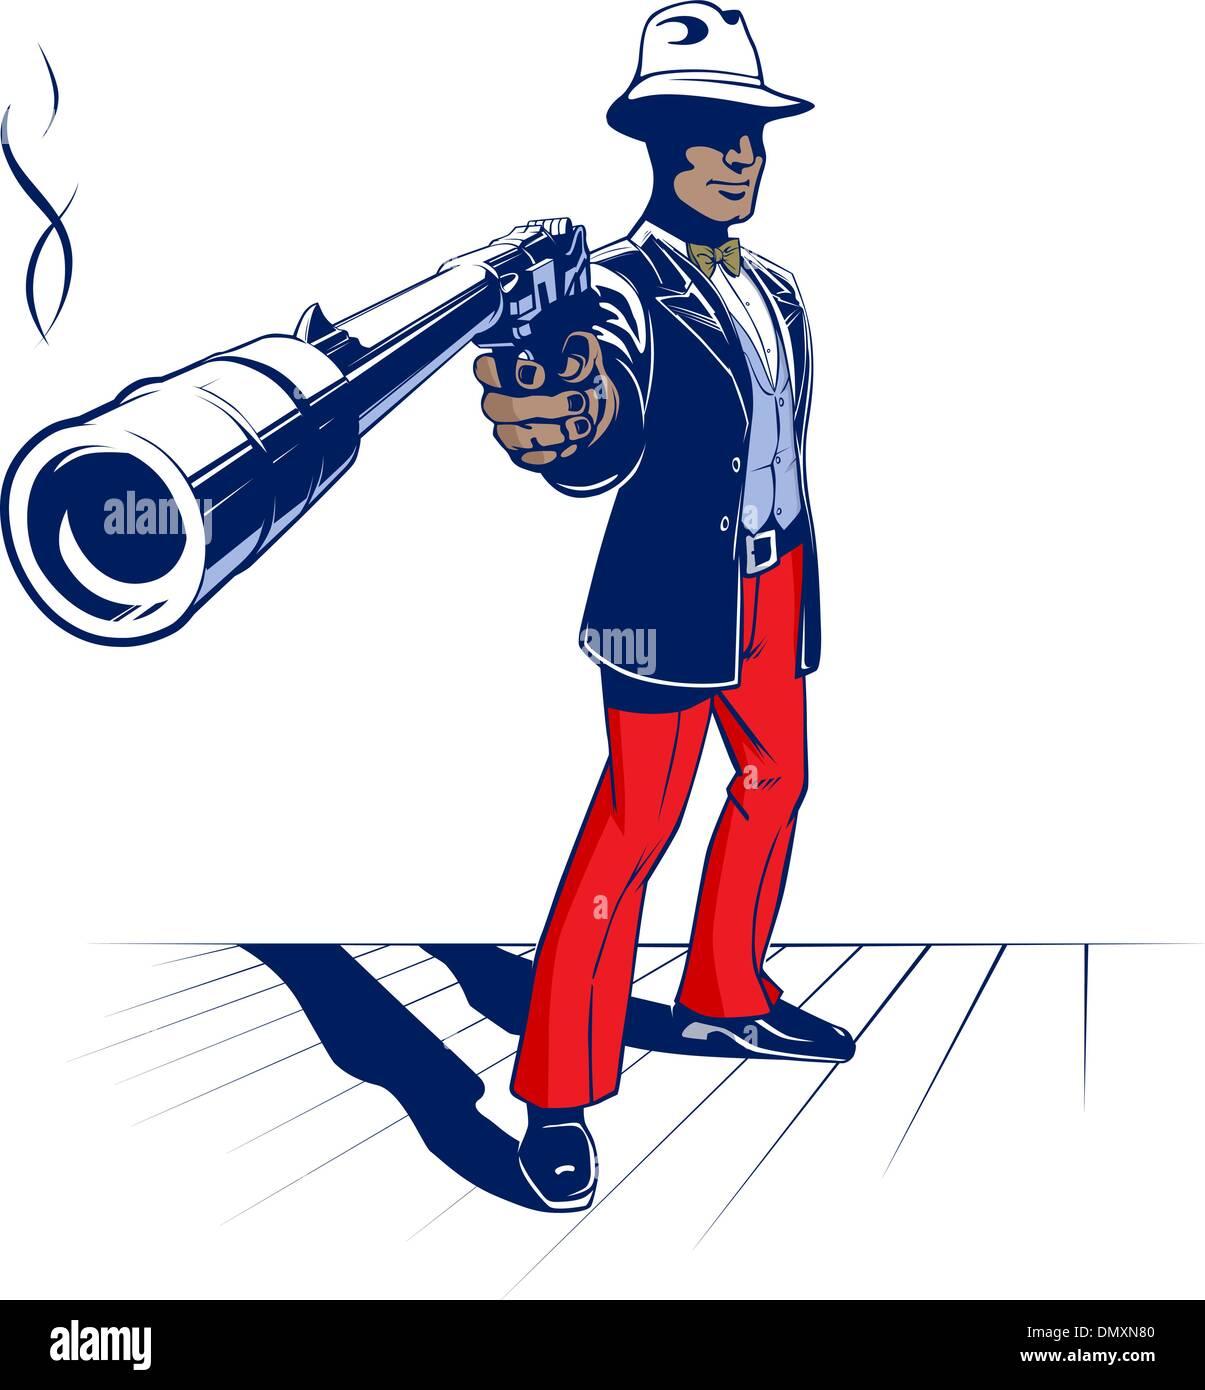 cartoon illustration of mobster - Stock Image